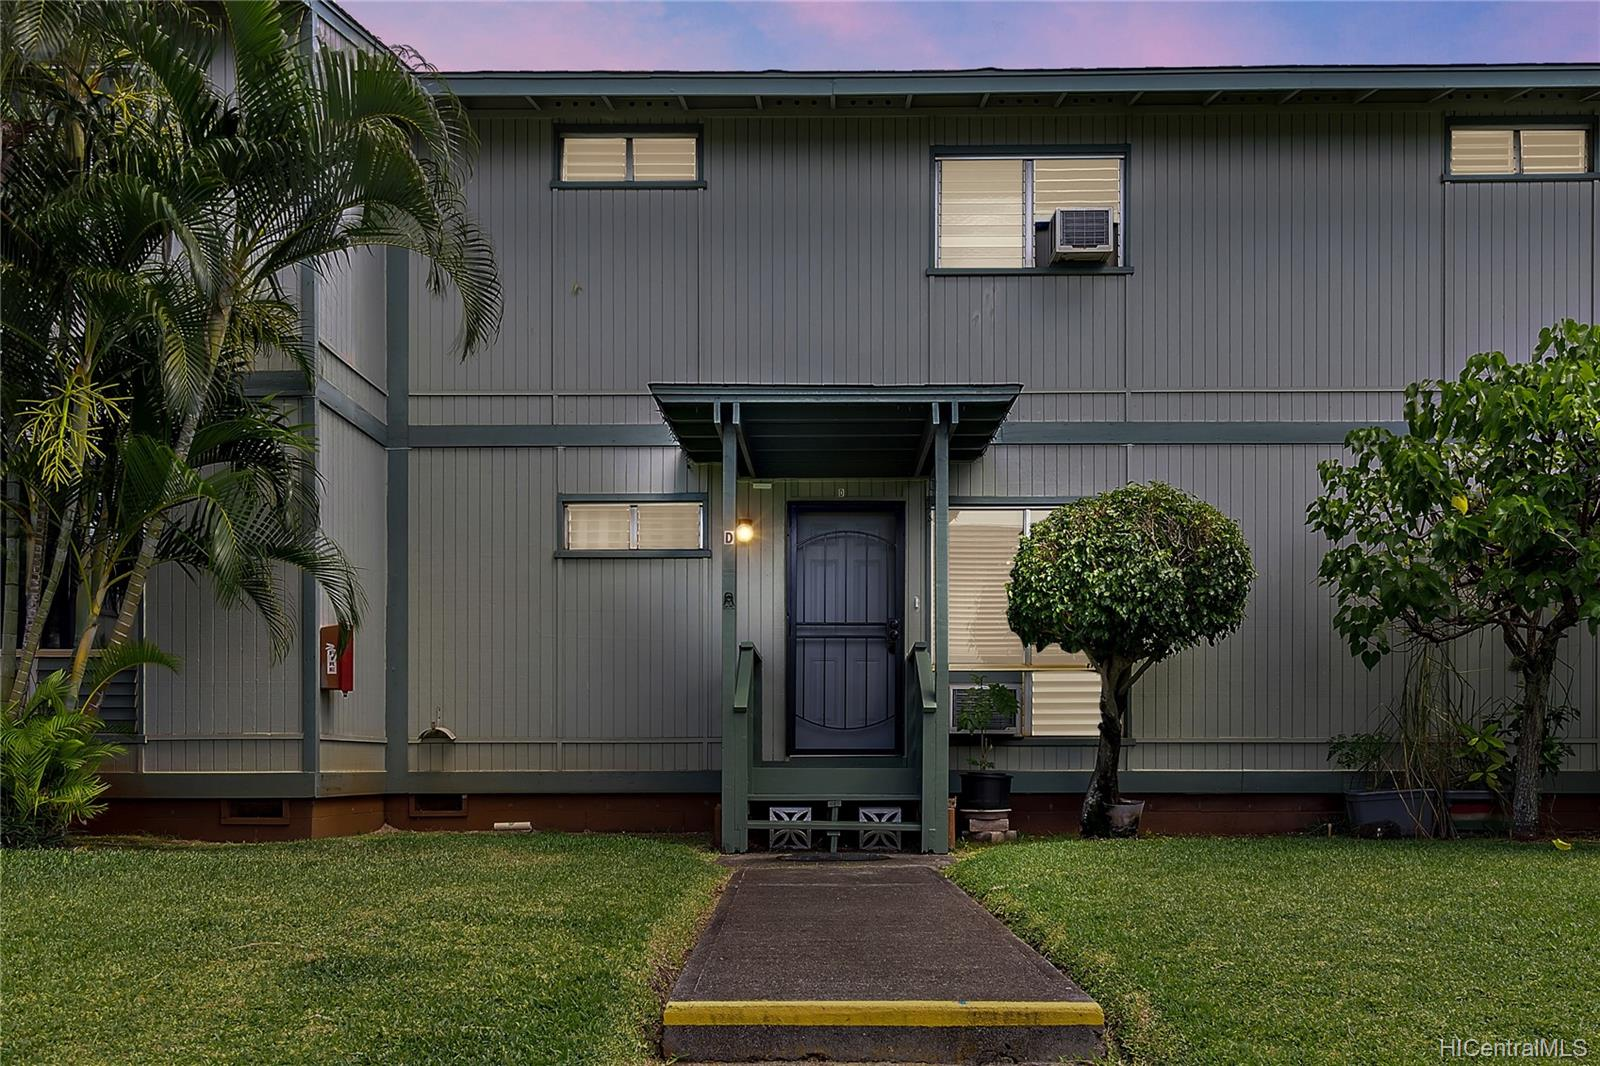 98-1438 Kaahumanu Street townhouse # D, Pearl City, Hawaii - photo 1 of 14